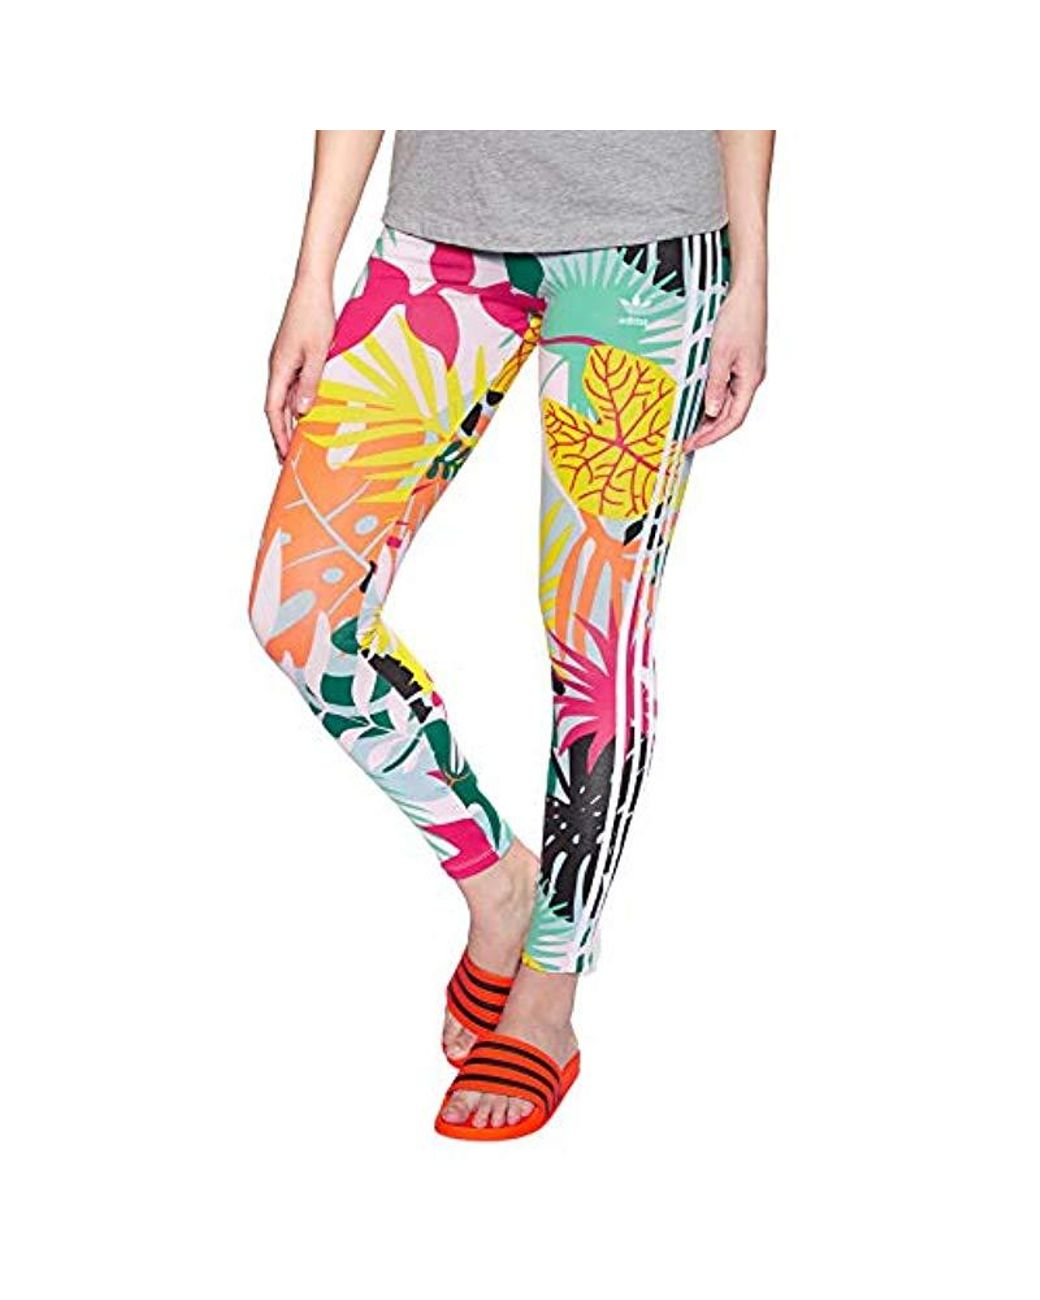 346ee2b36b Lyst - adidas Originals 3-stripes Leggings